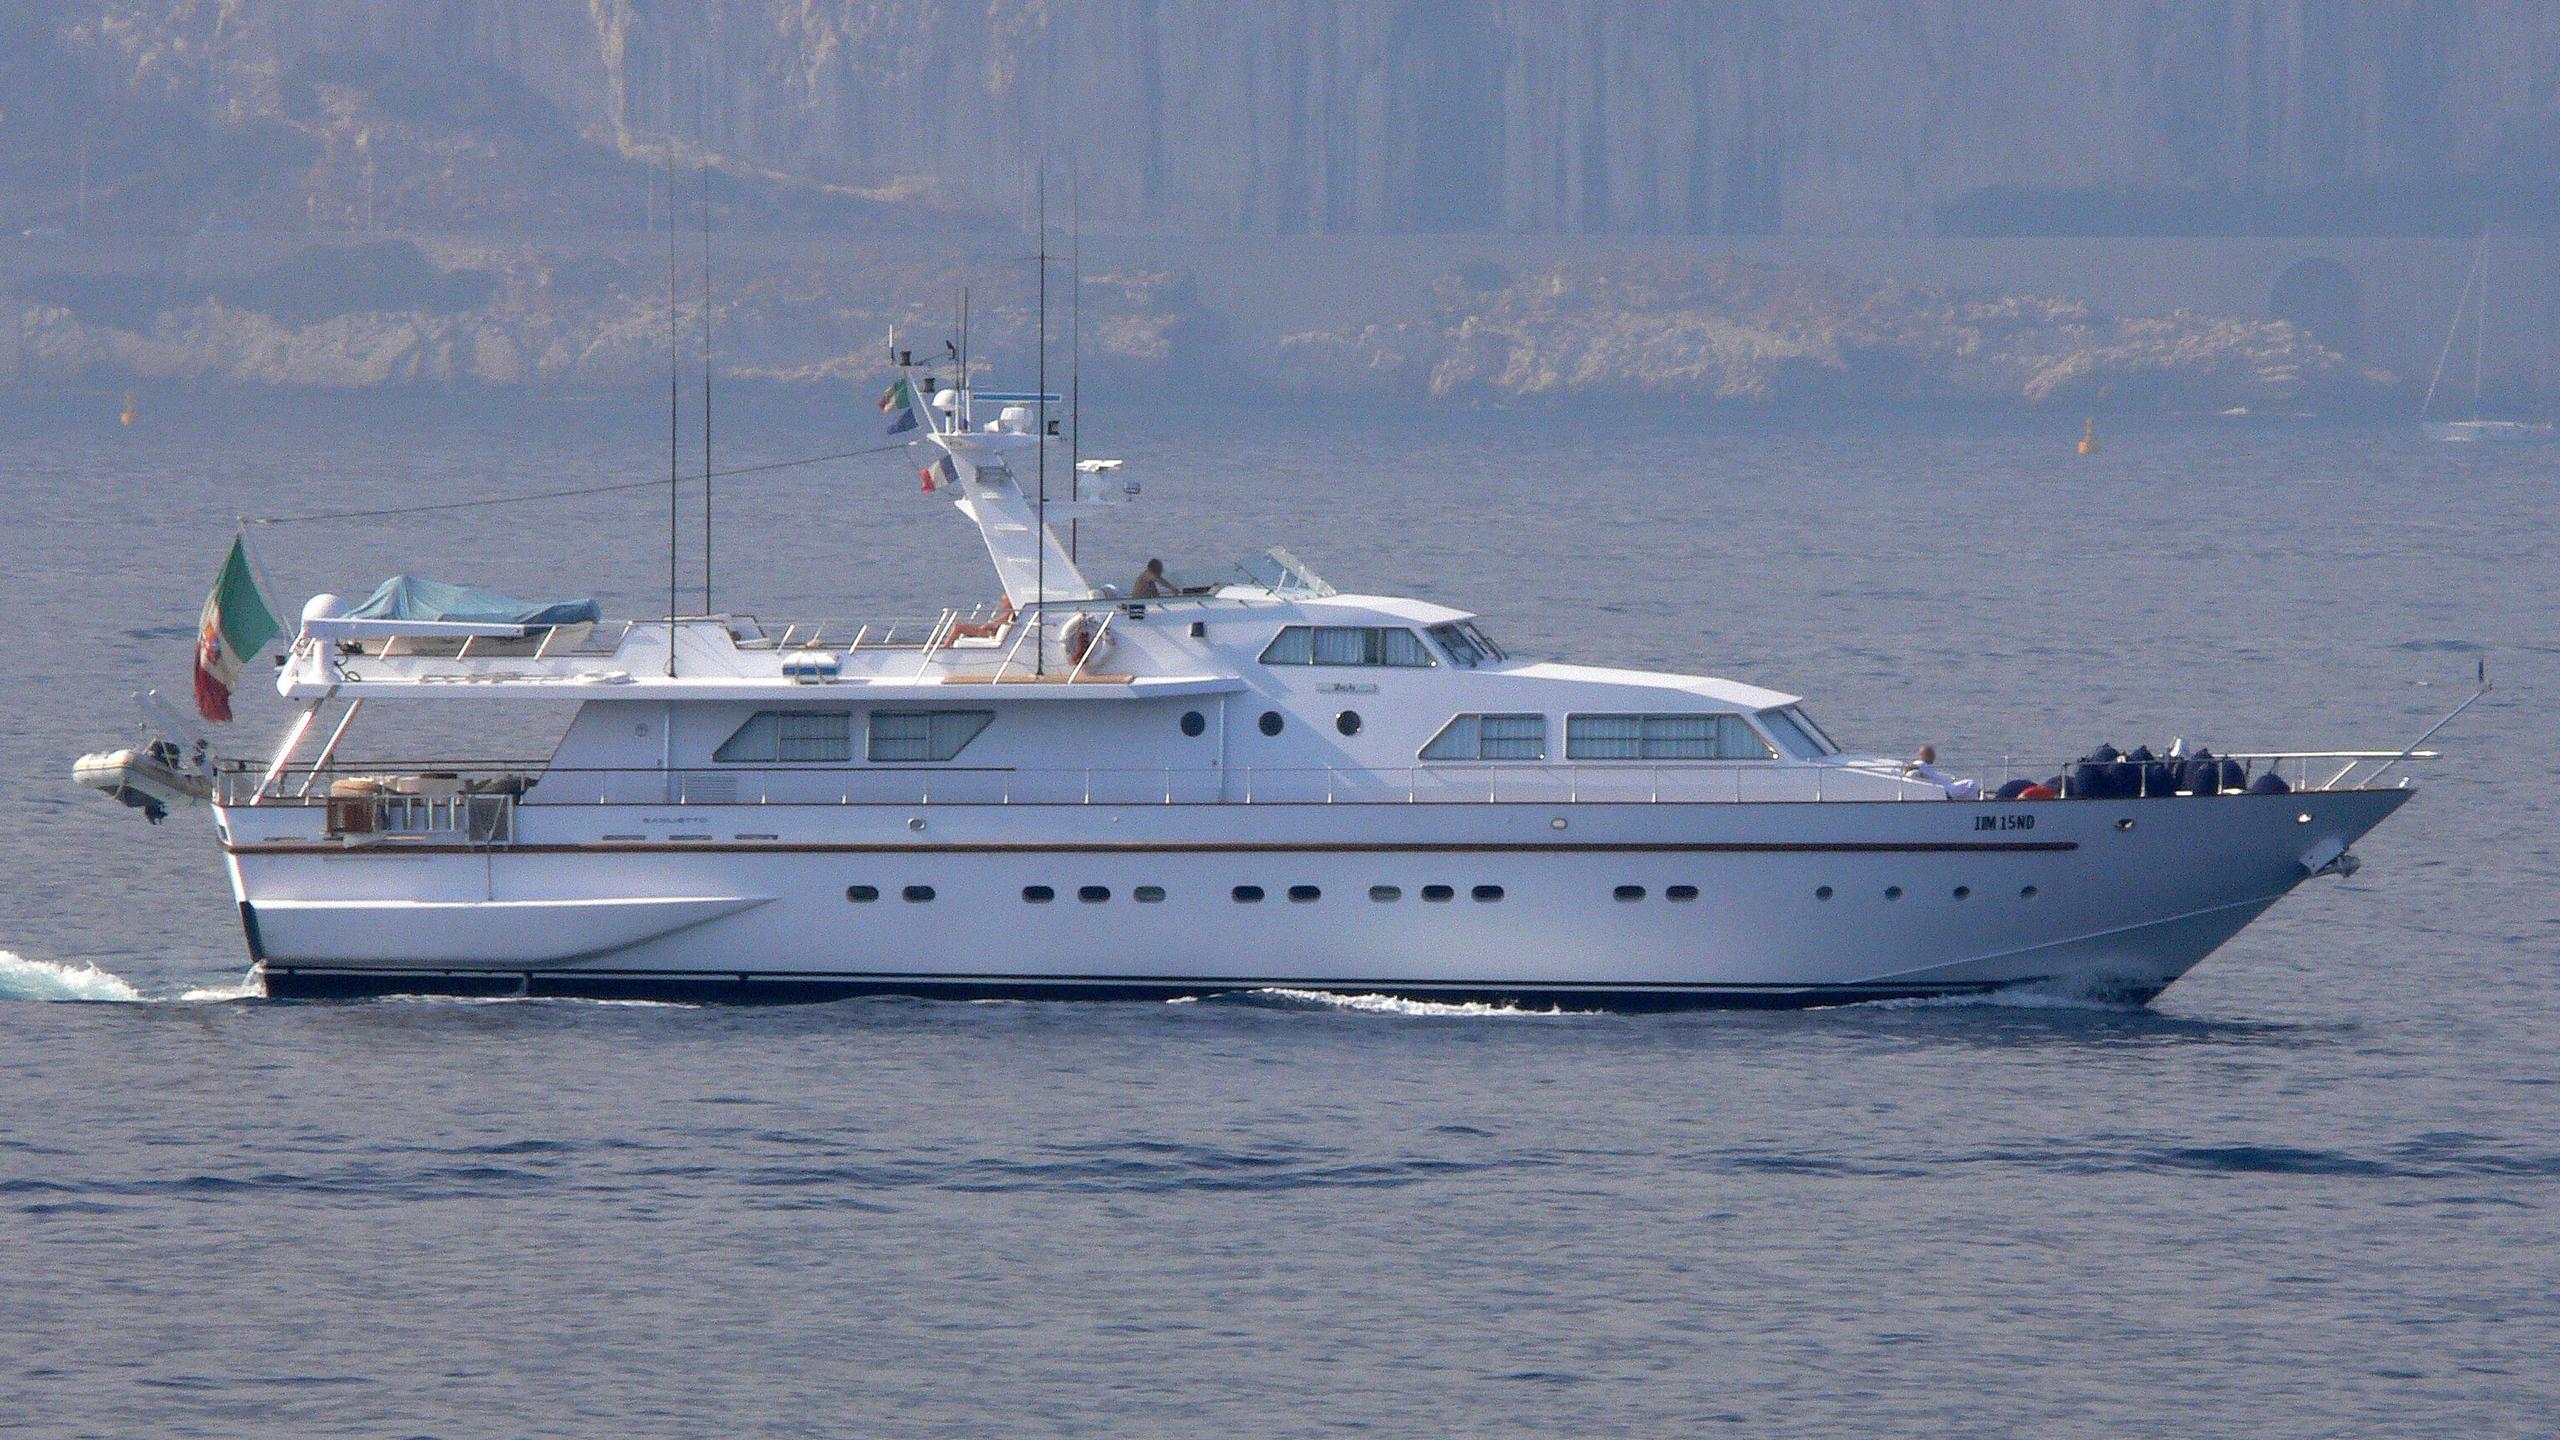 luc-an-motor-yacht-baglietto-1989-31m-profile